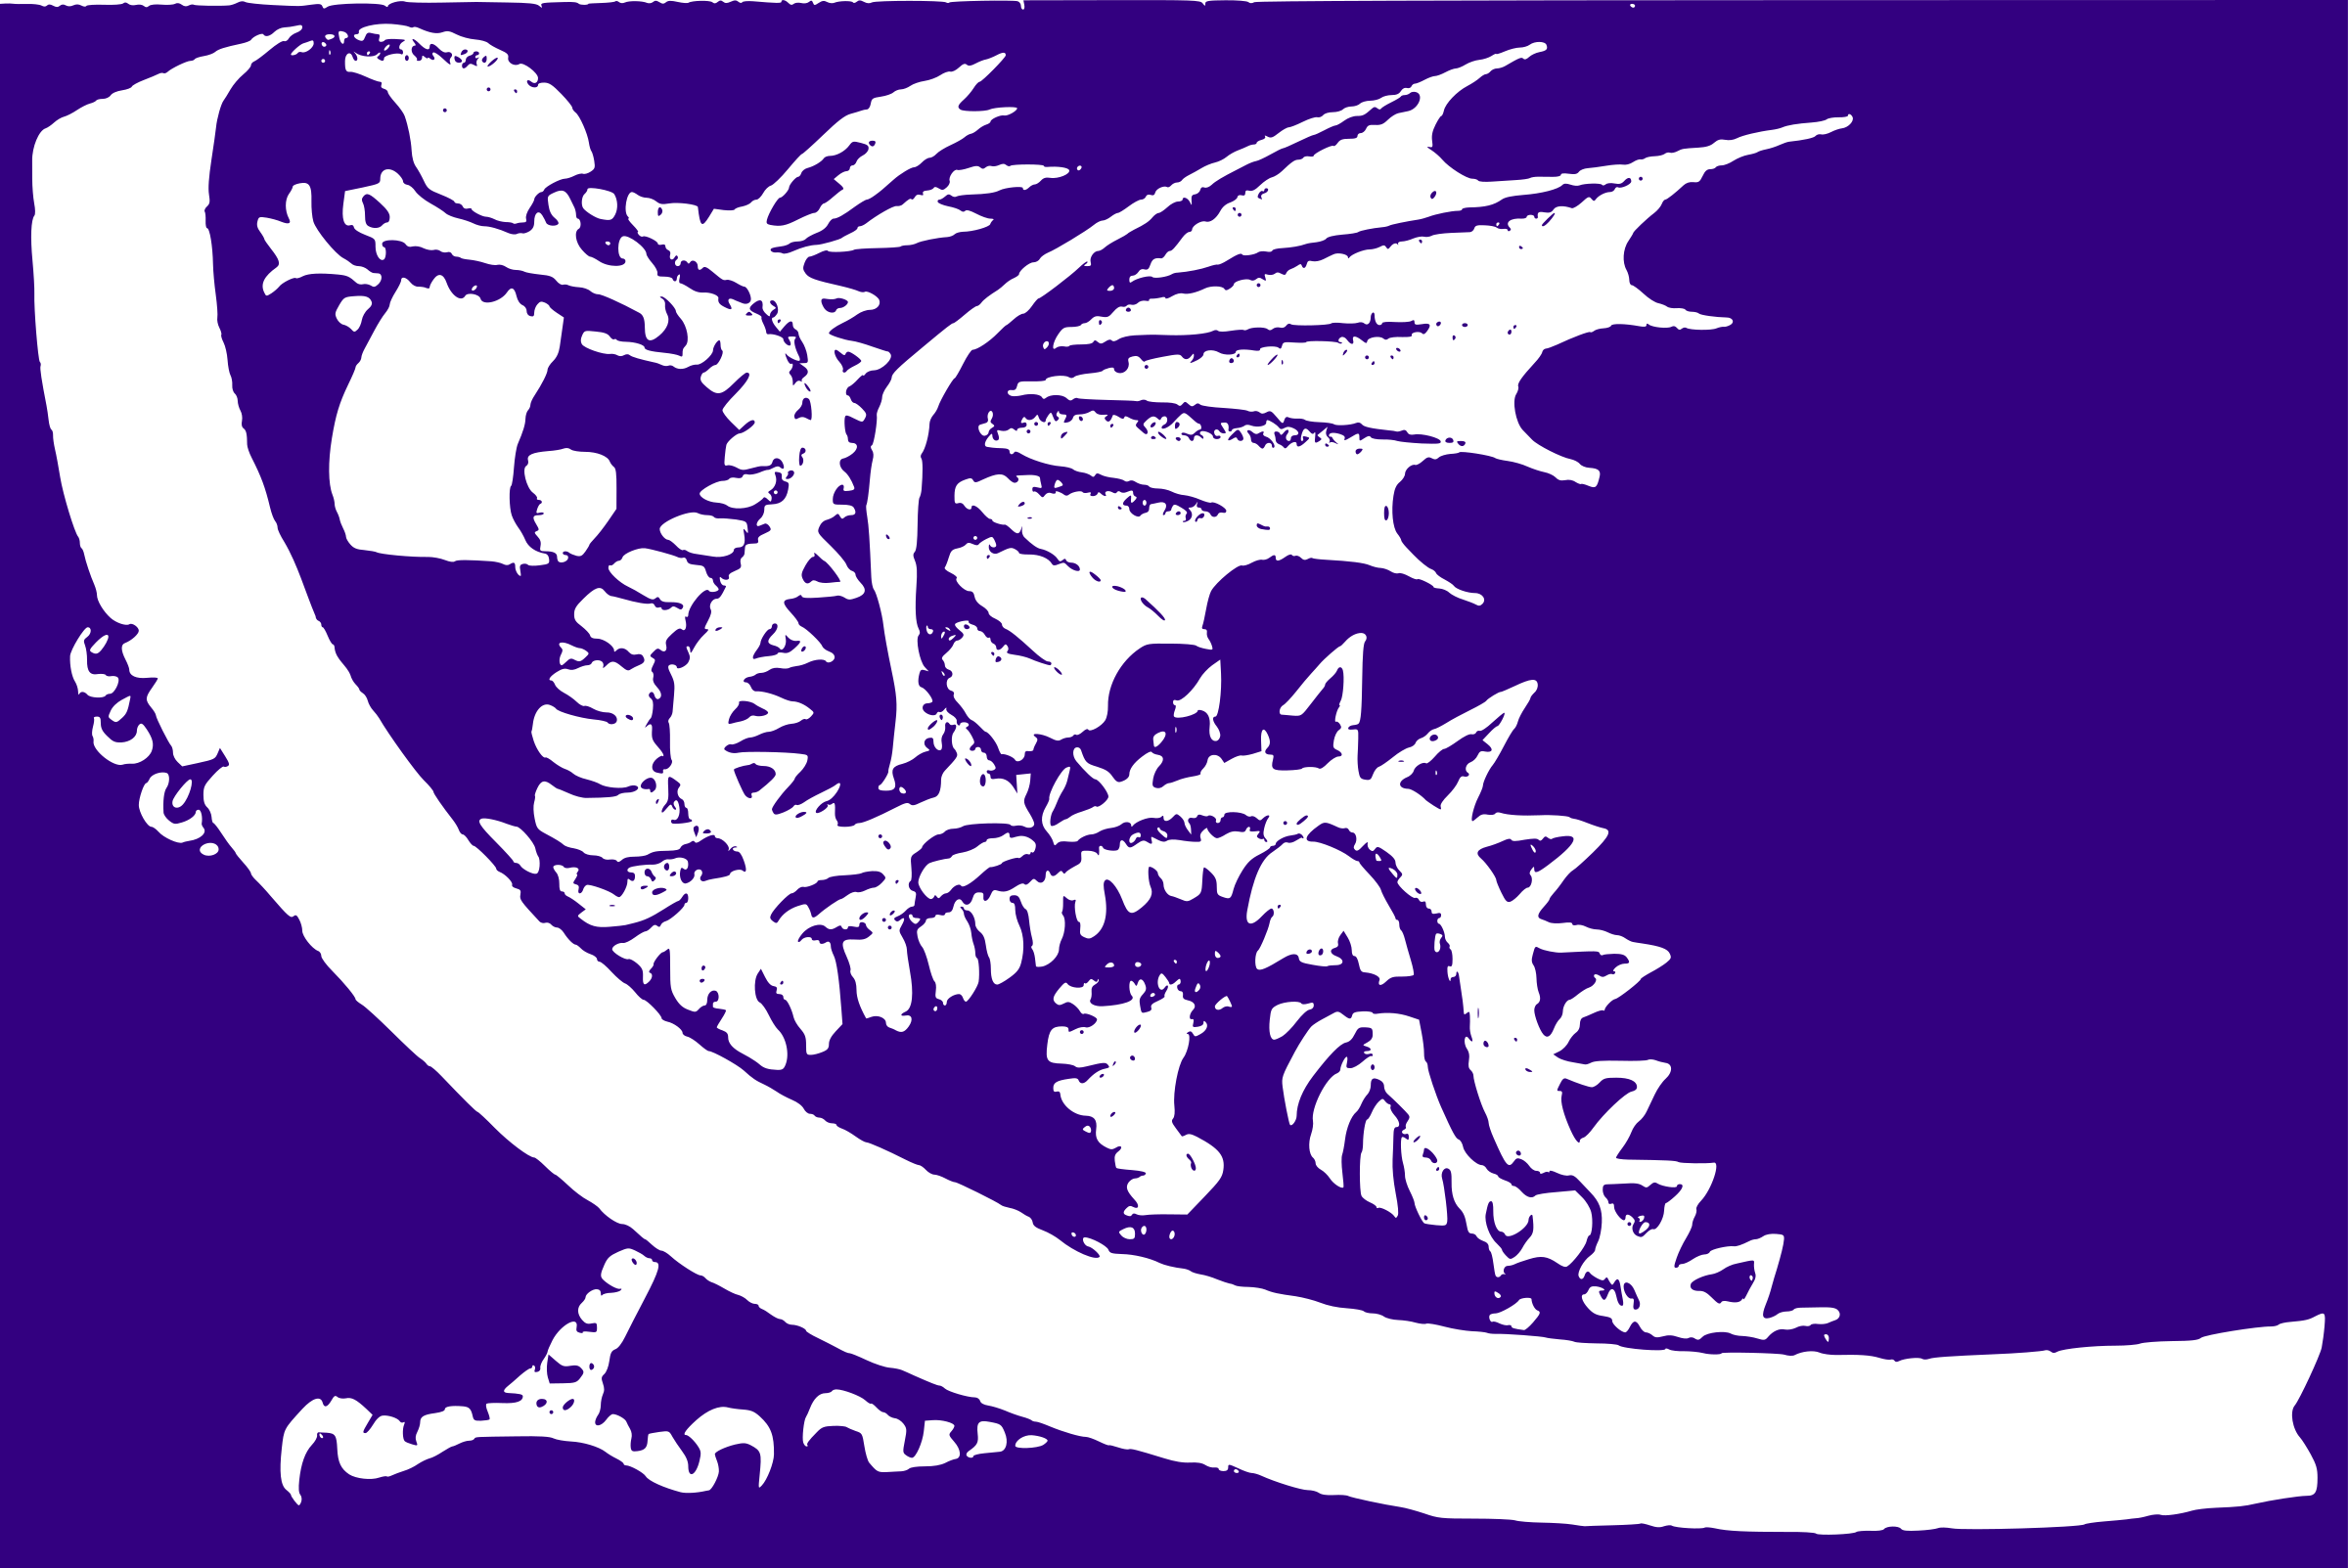 Big image png. Dragon clipart purple dragon